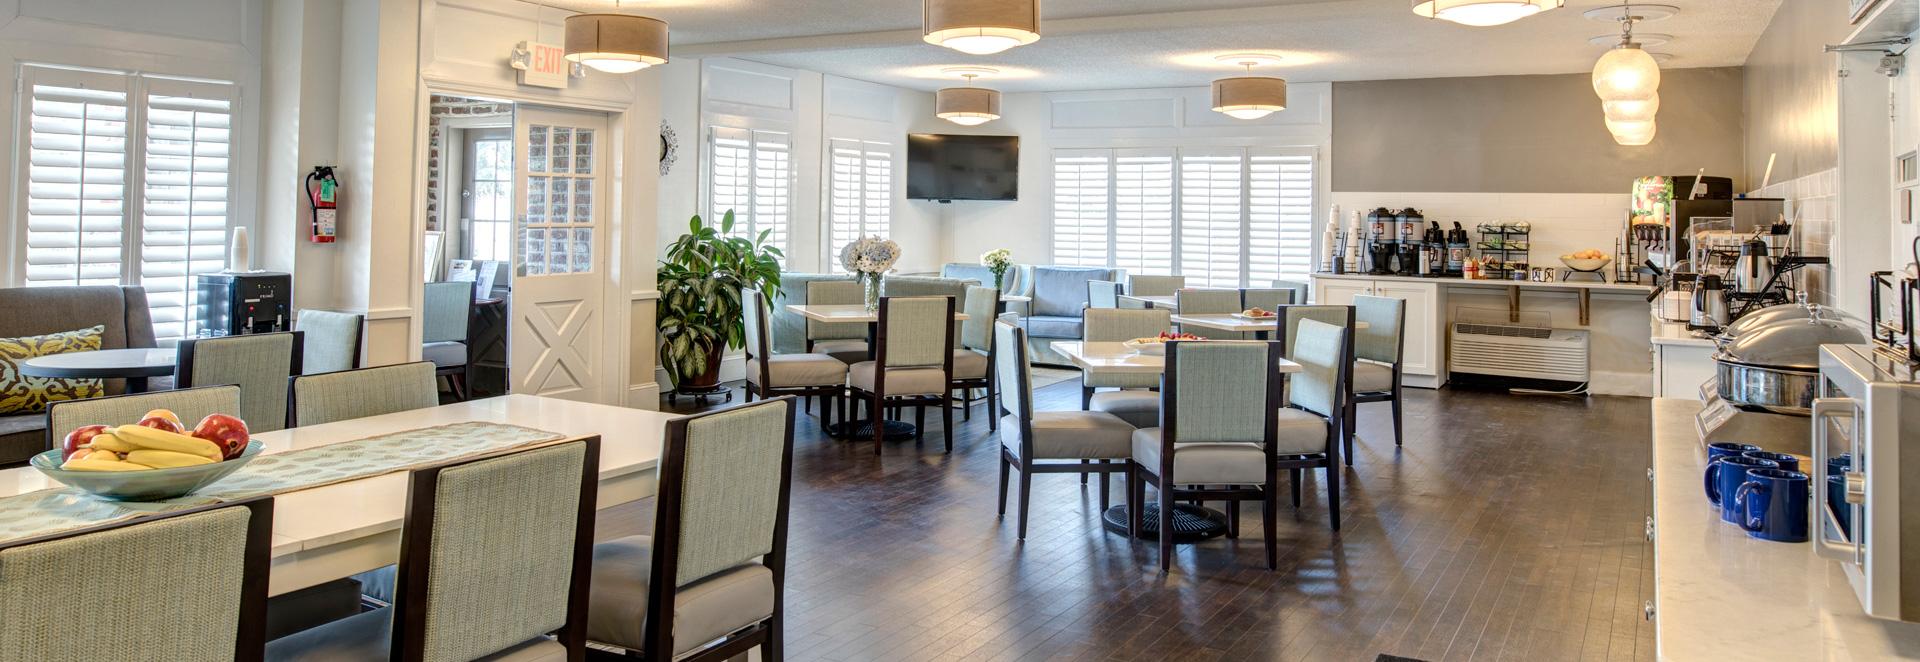 Dining At Western Sea Island Inn, Beaufort South Carolina